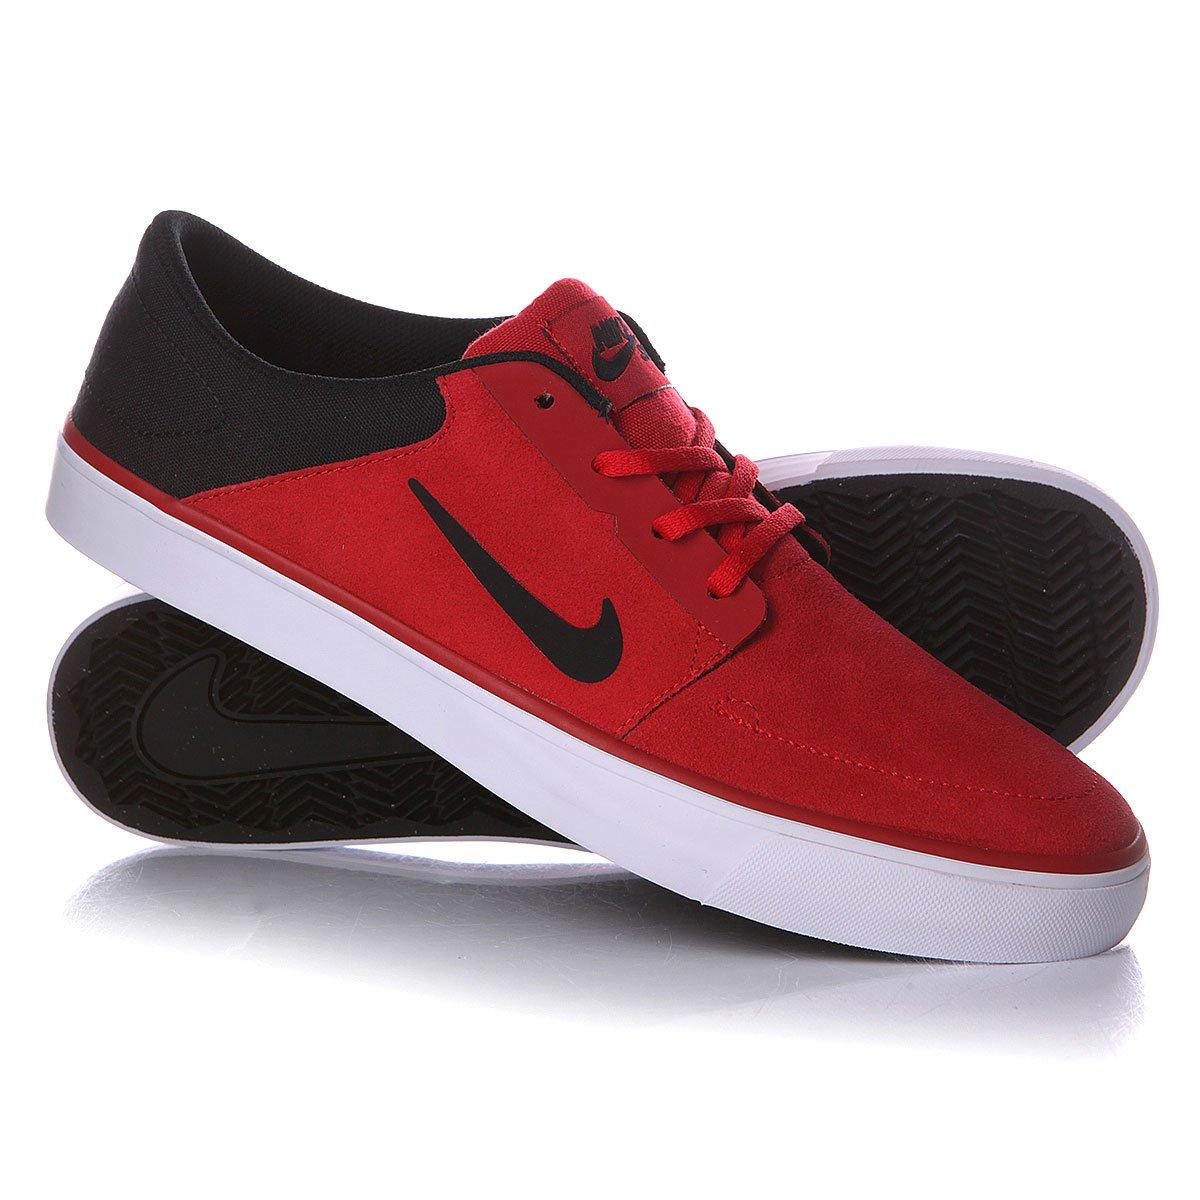 070a156b Купить кеды Nike Sb Portmore Gym Red/Black/White (725027-601) в ...